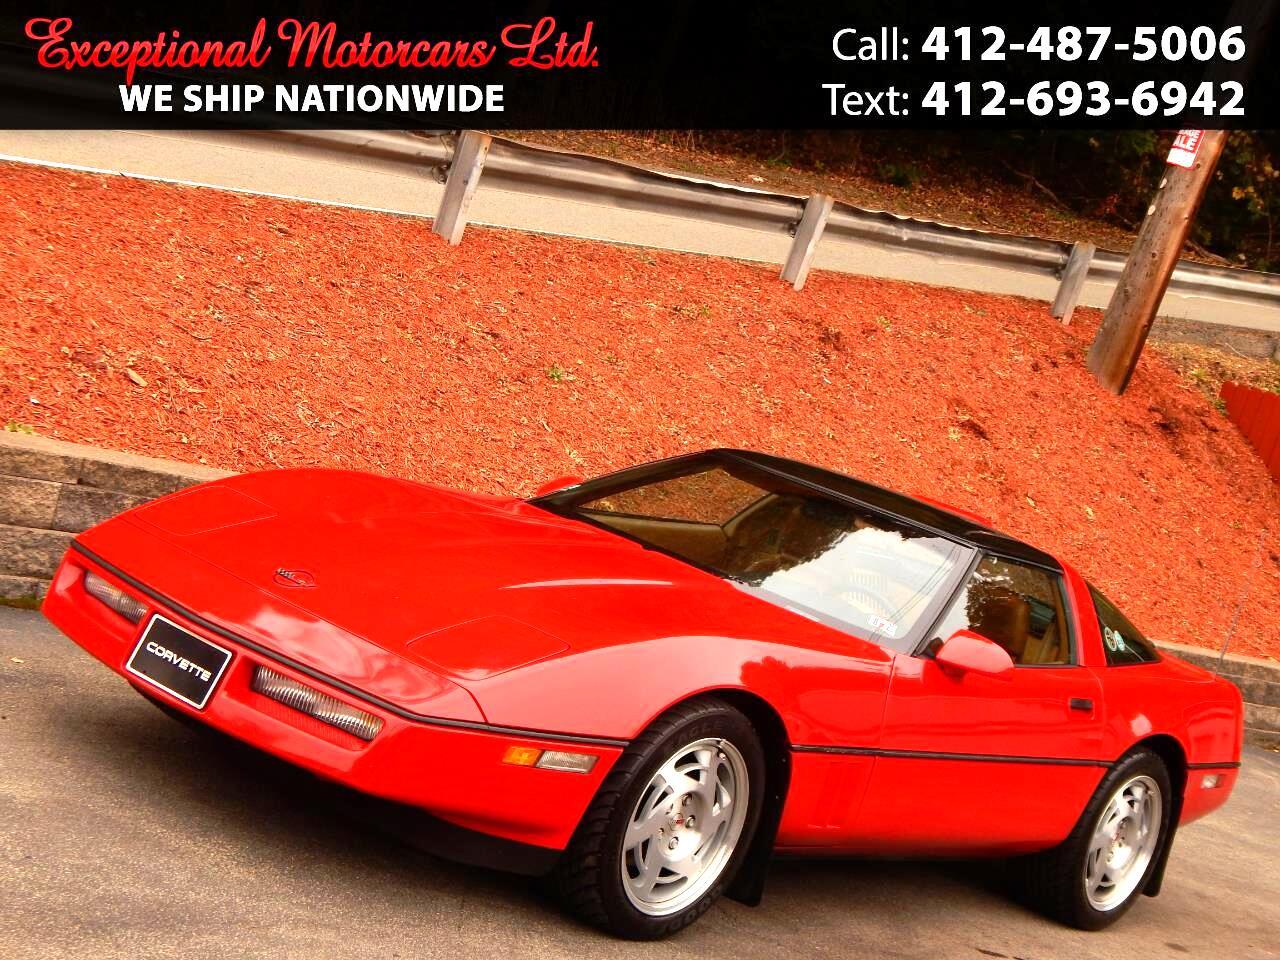 Chevrolet Corvette 2dr Coupe Hatchback 1990